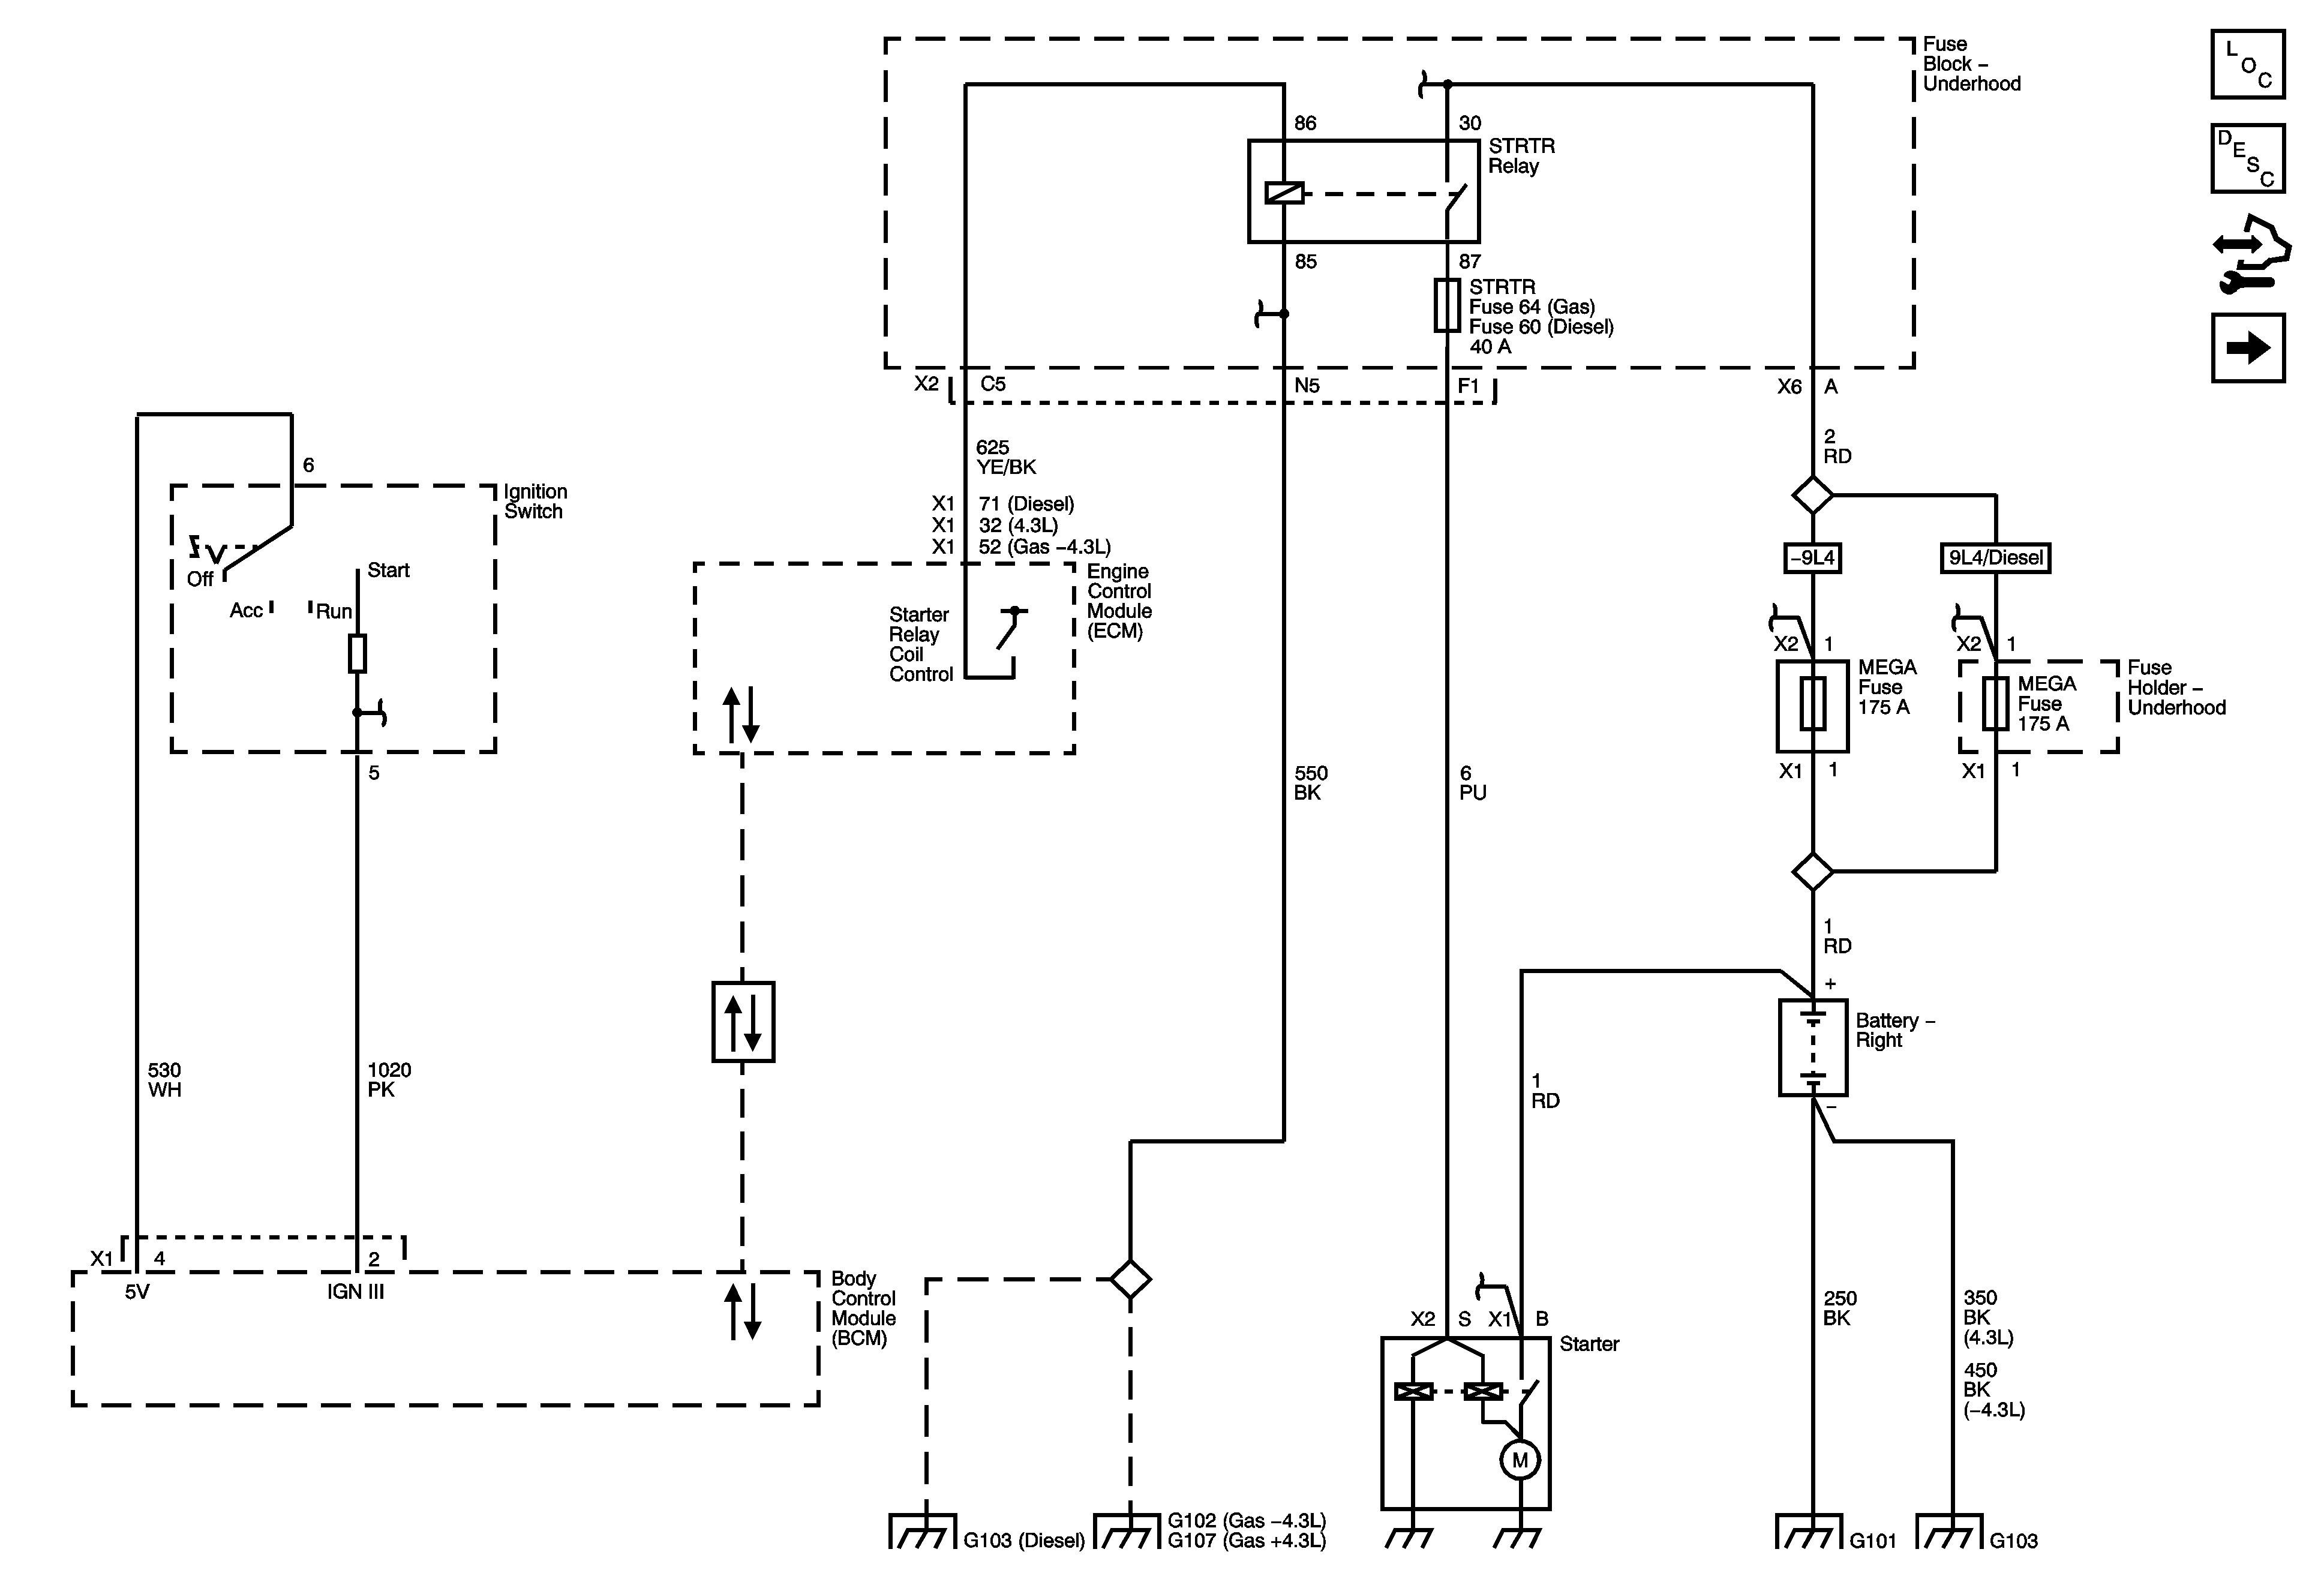 Diesel Engine Diagrams Pictures Unique Steering Wheel Radio Controls Wiring Diagram Diagram Of Diesel Engine Diagrams Pictures